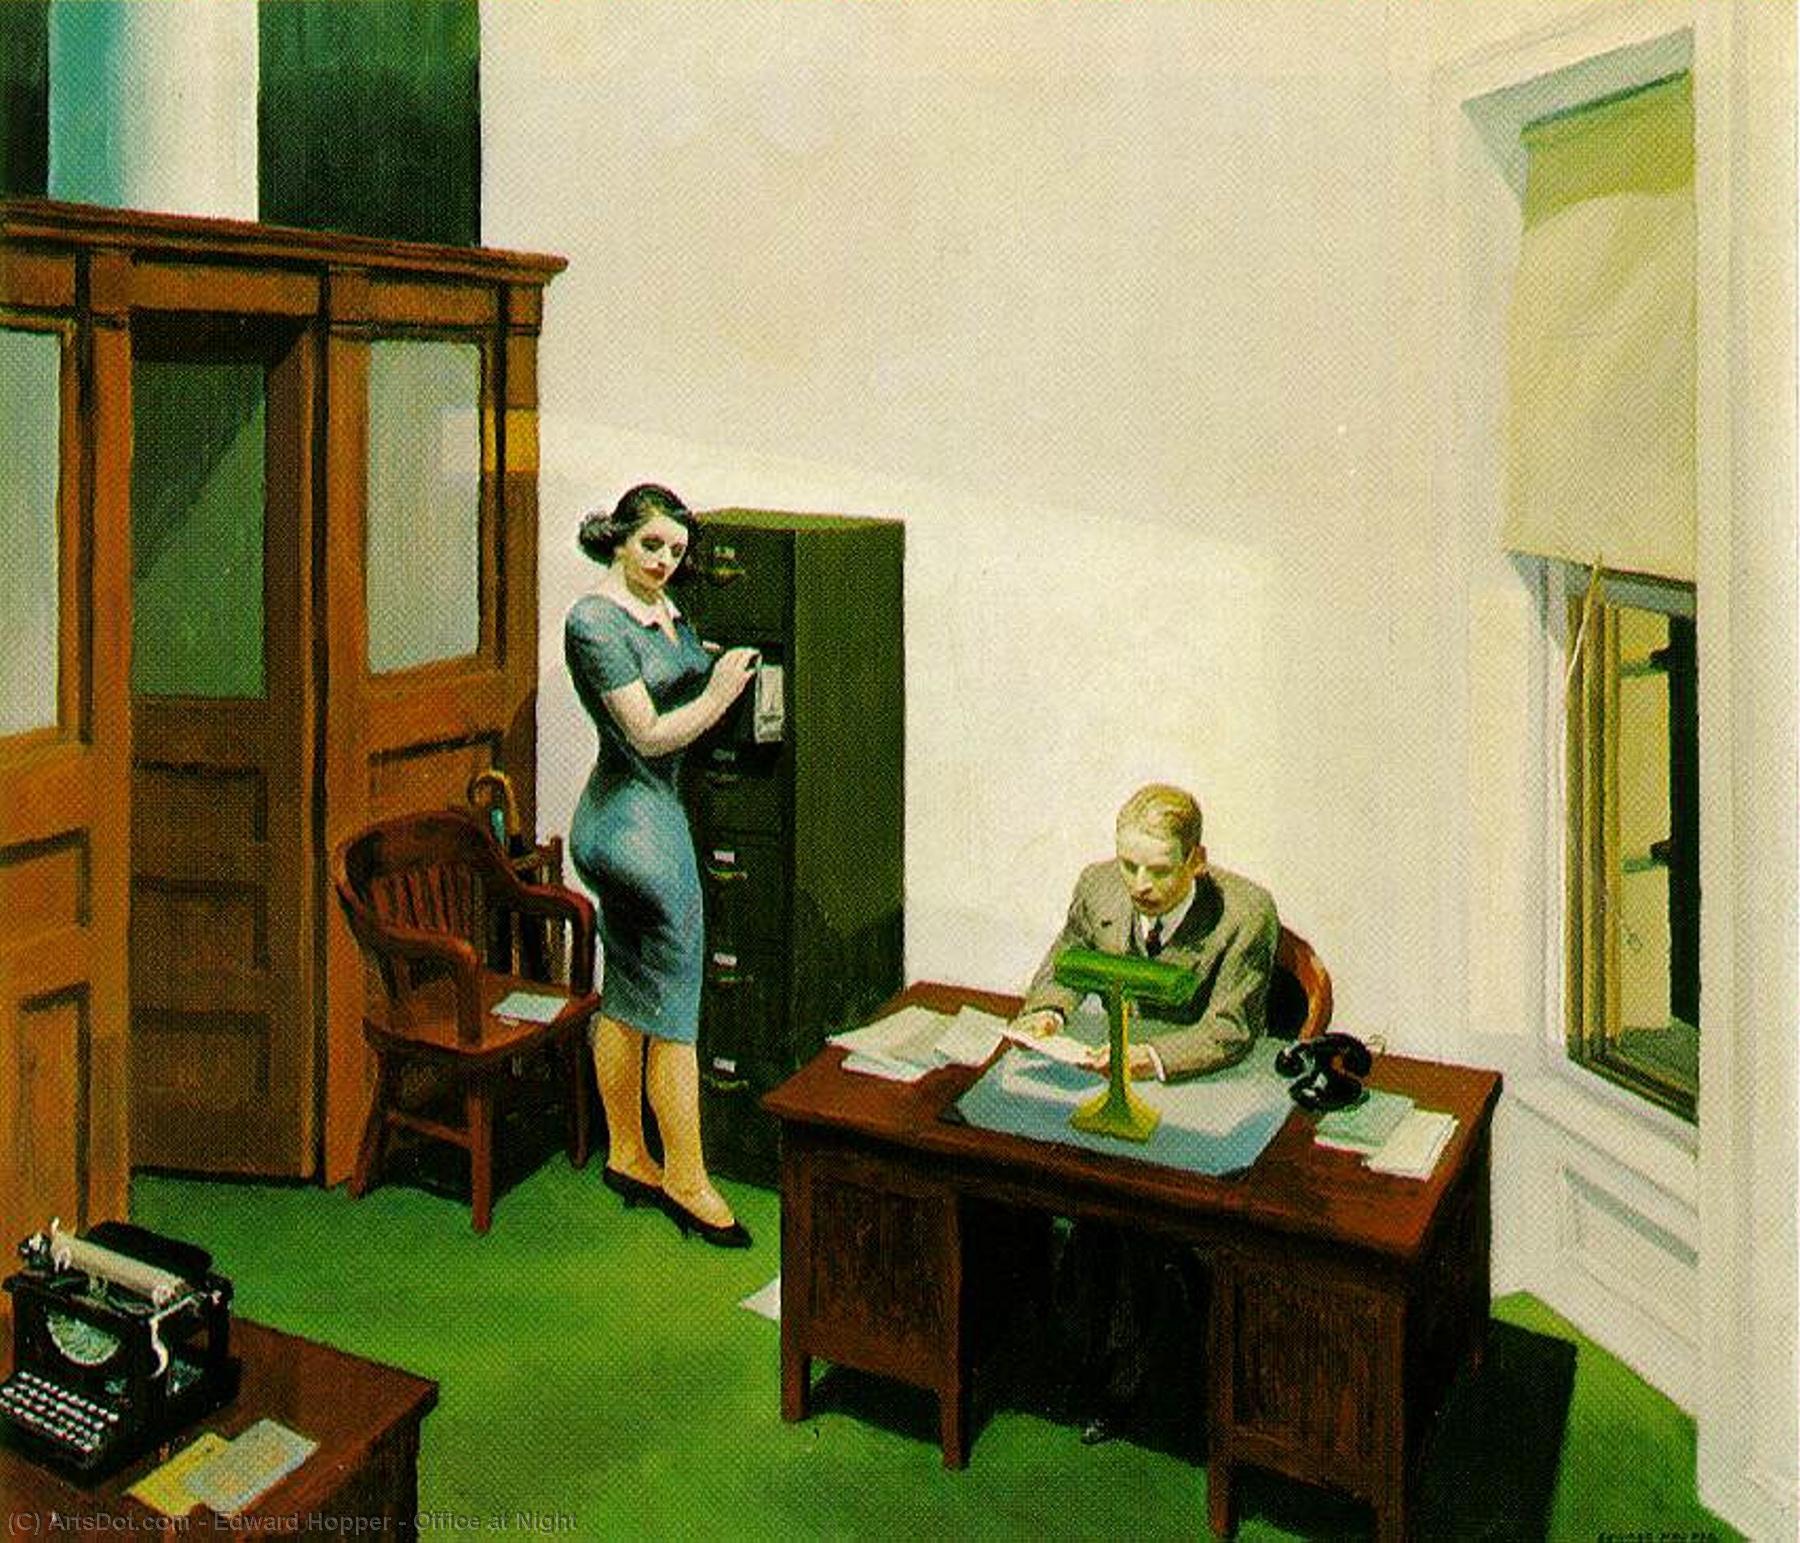 WikiOO.org - Enciclopédia das Belas Artes - Pintura, Arte por Edward Hopper - Office at Night